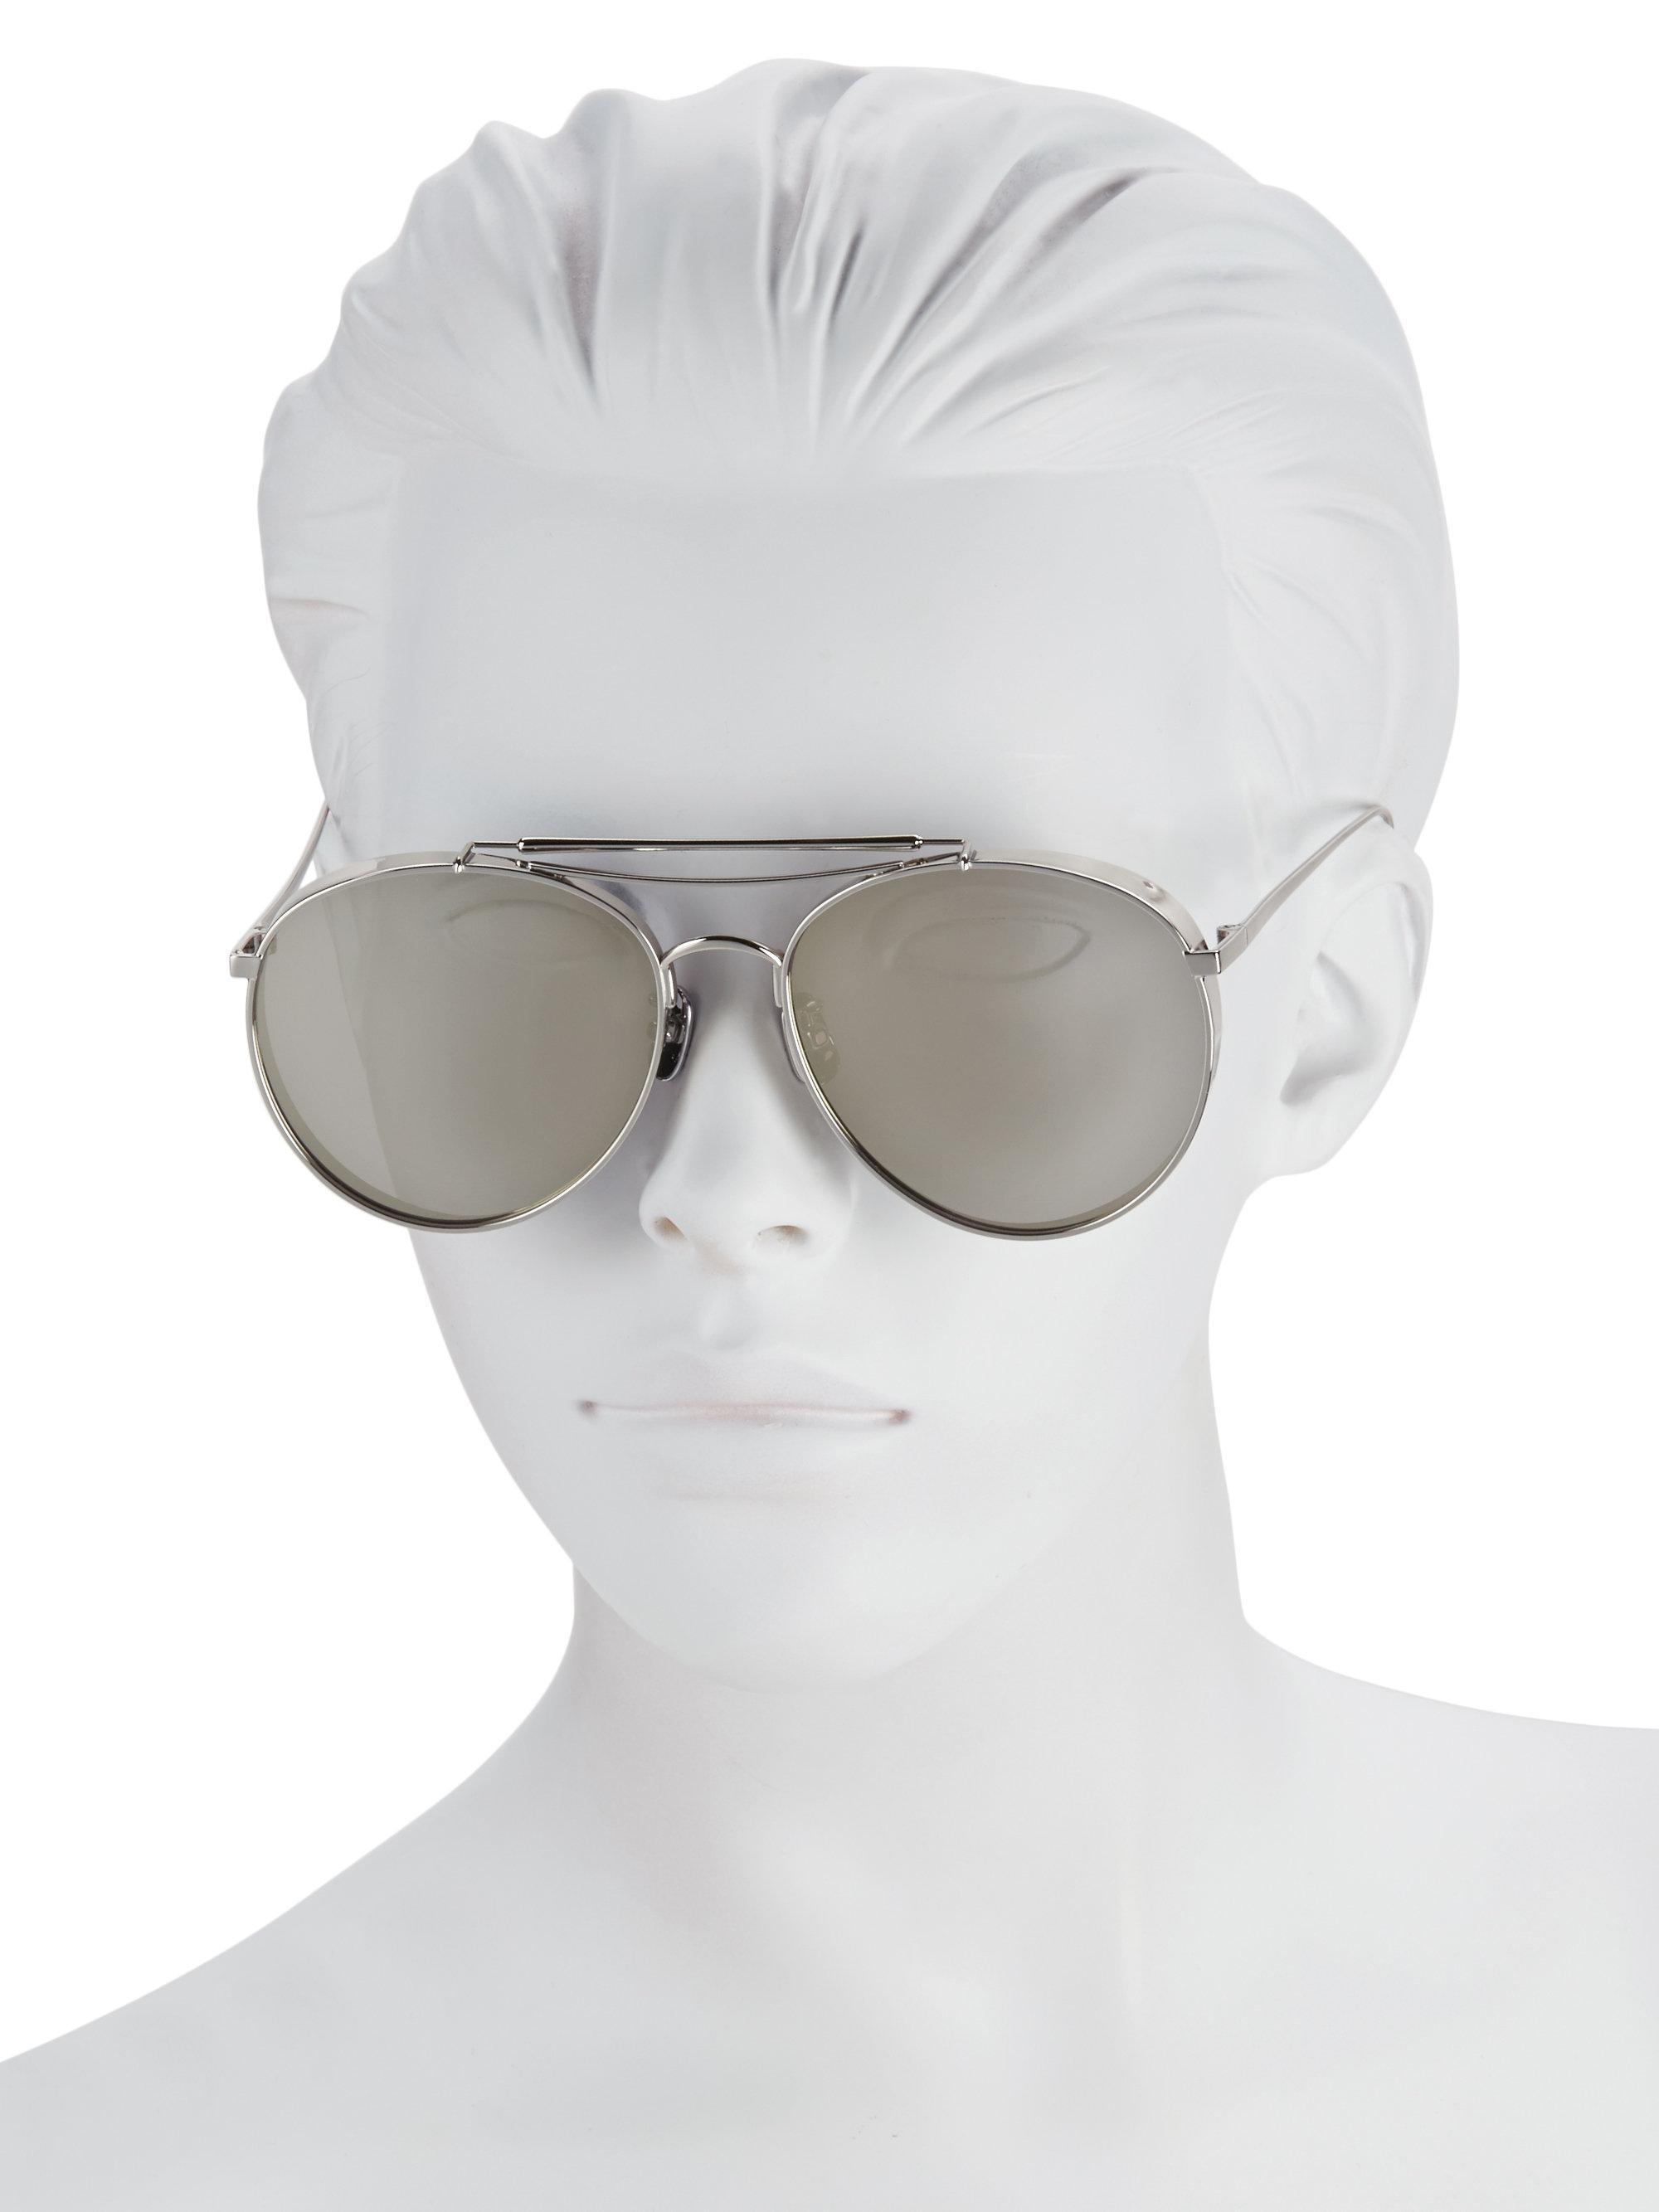 bbb0776b59 Lyst - Gentle Monster 56mm Big Bully Aviator Sunglasses in Gray